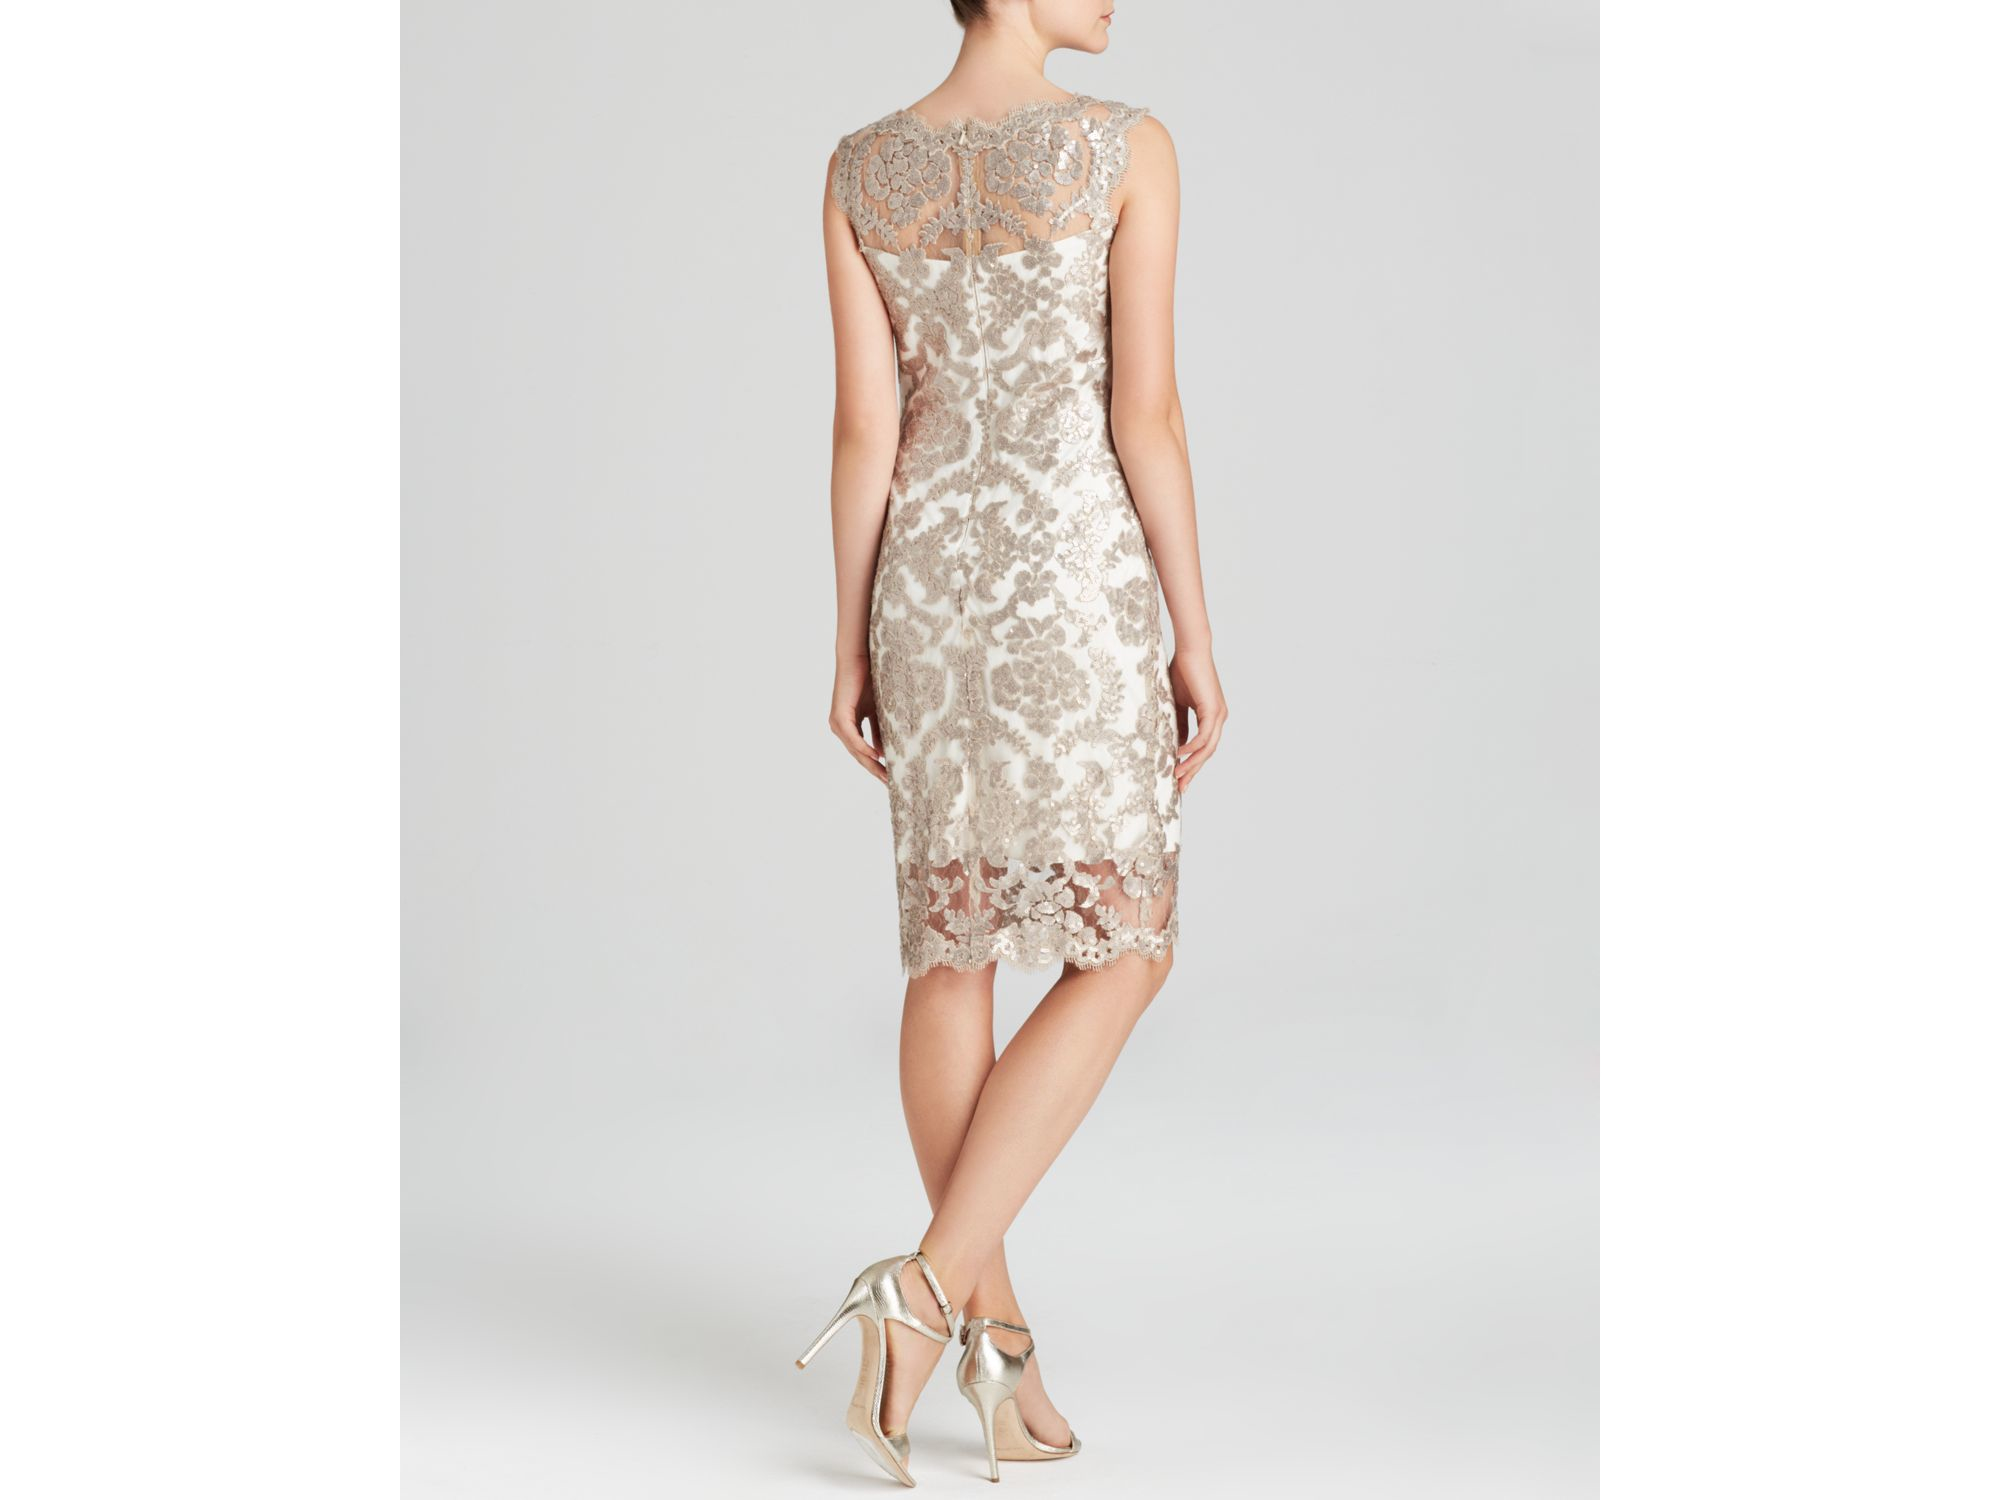 e5eab068b24e2 Lyst - Tadashi Shoji Dress - Sleeveless Illusion Neckline Sequin ...